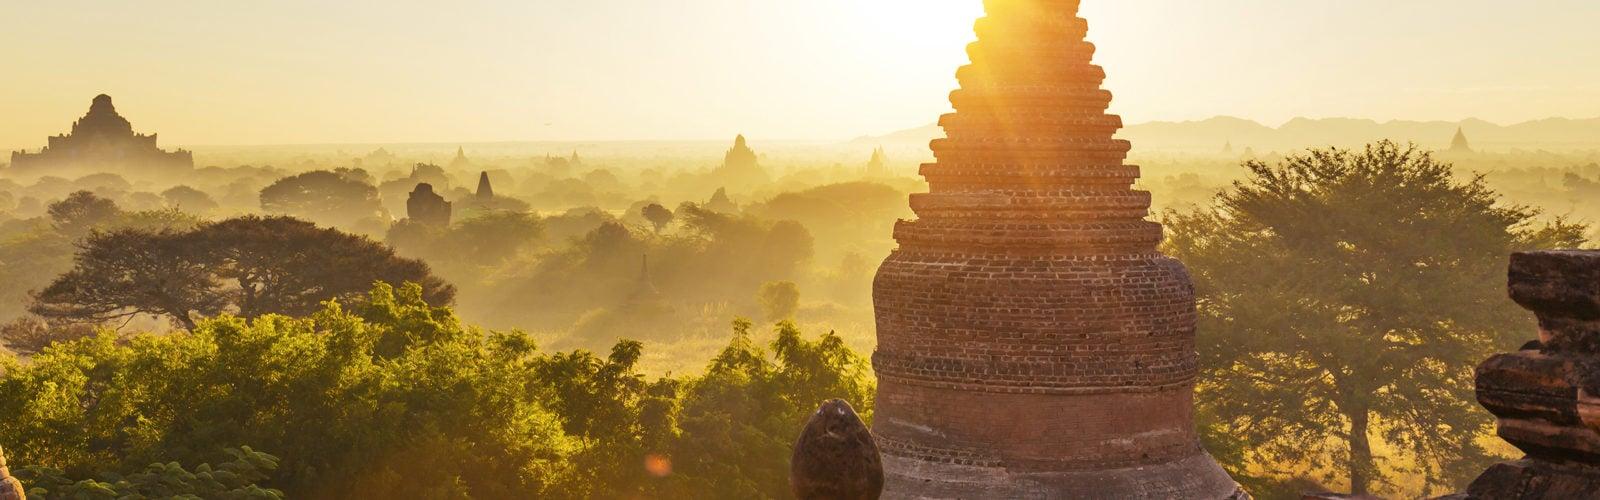 bagan-pagoda-sunlight